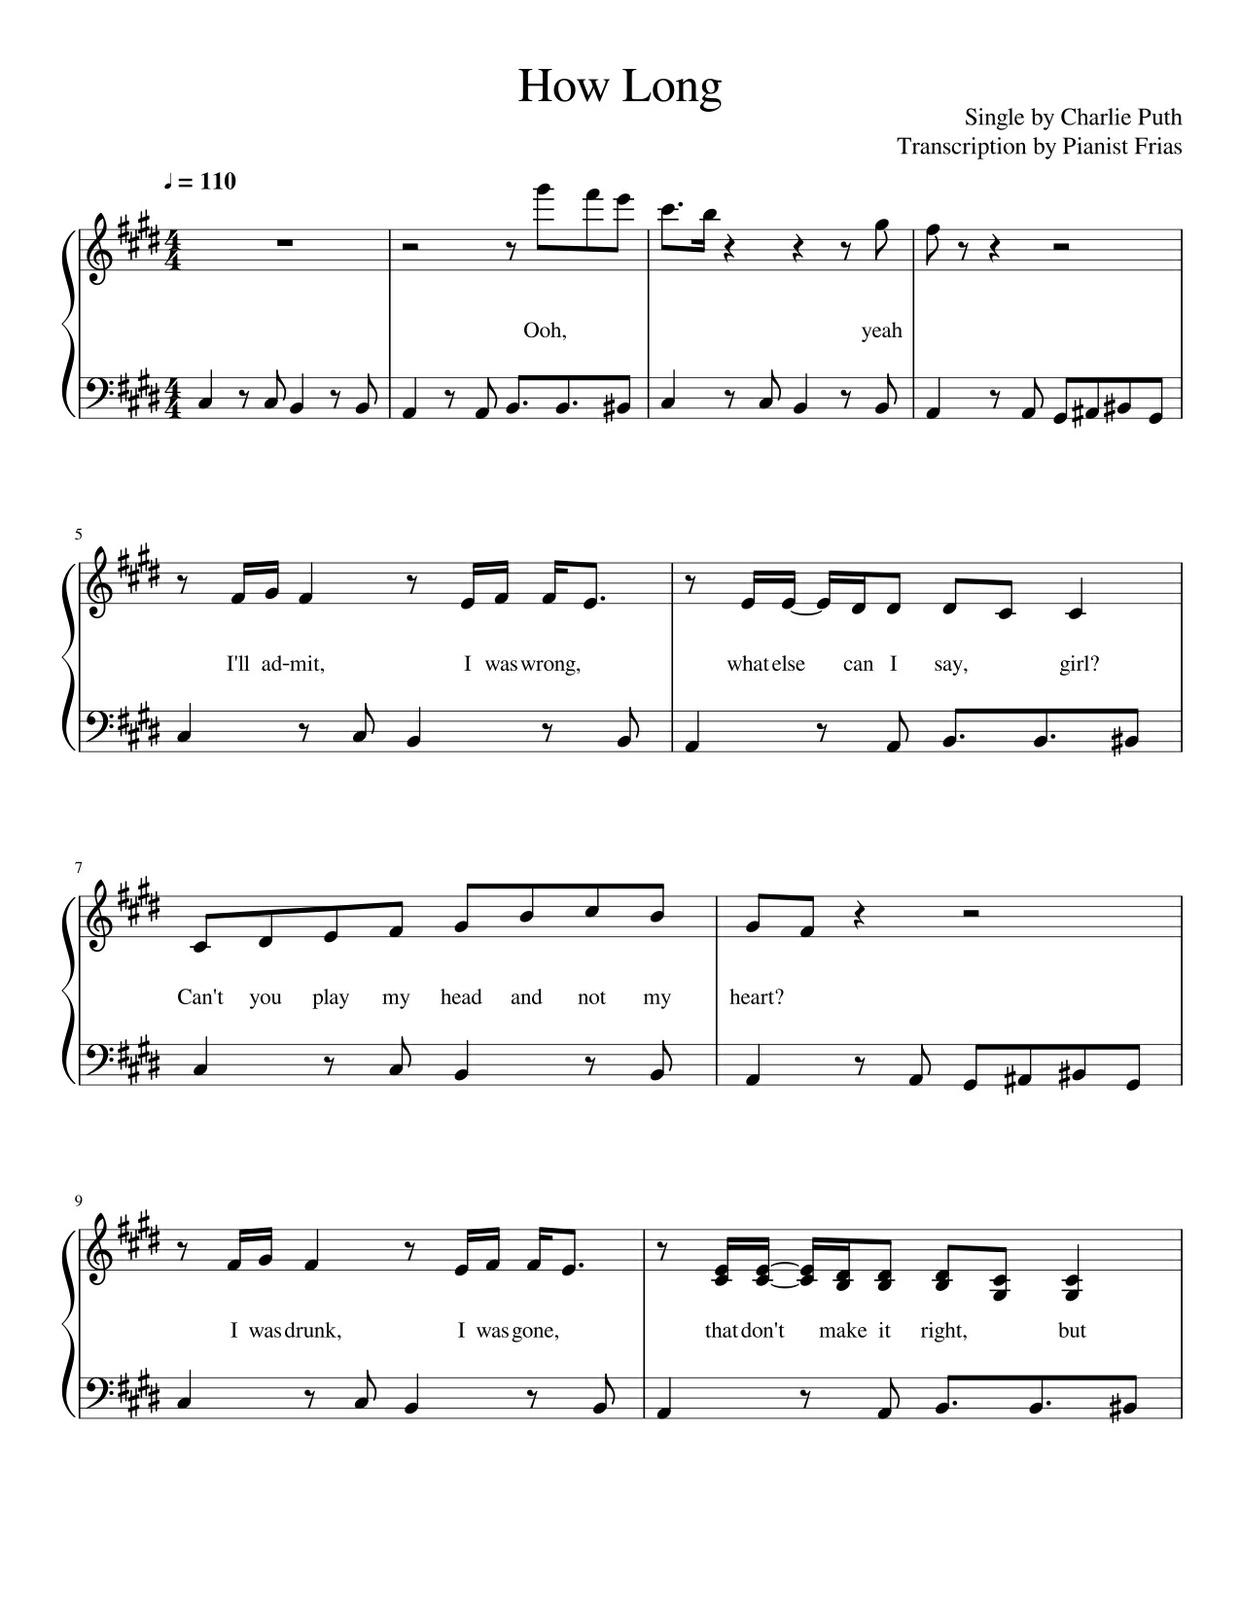 Charlie Puth - How Long (pdf)